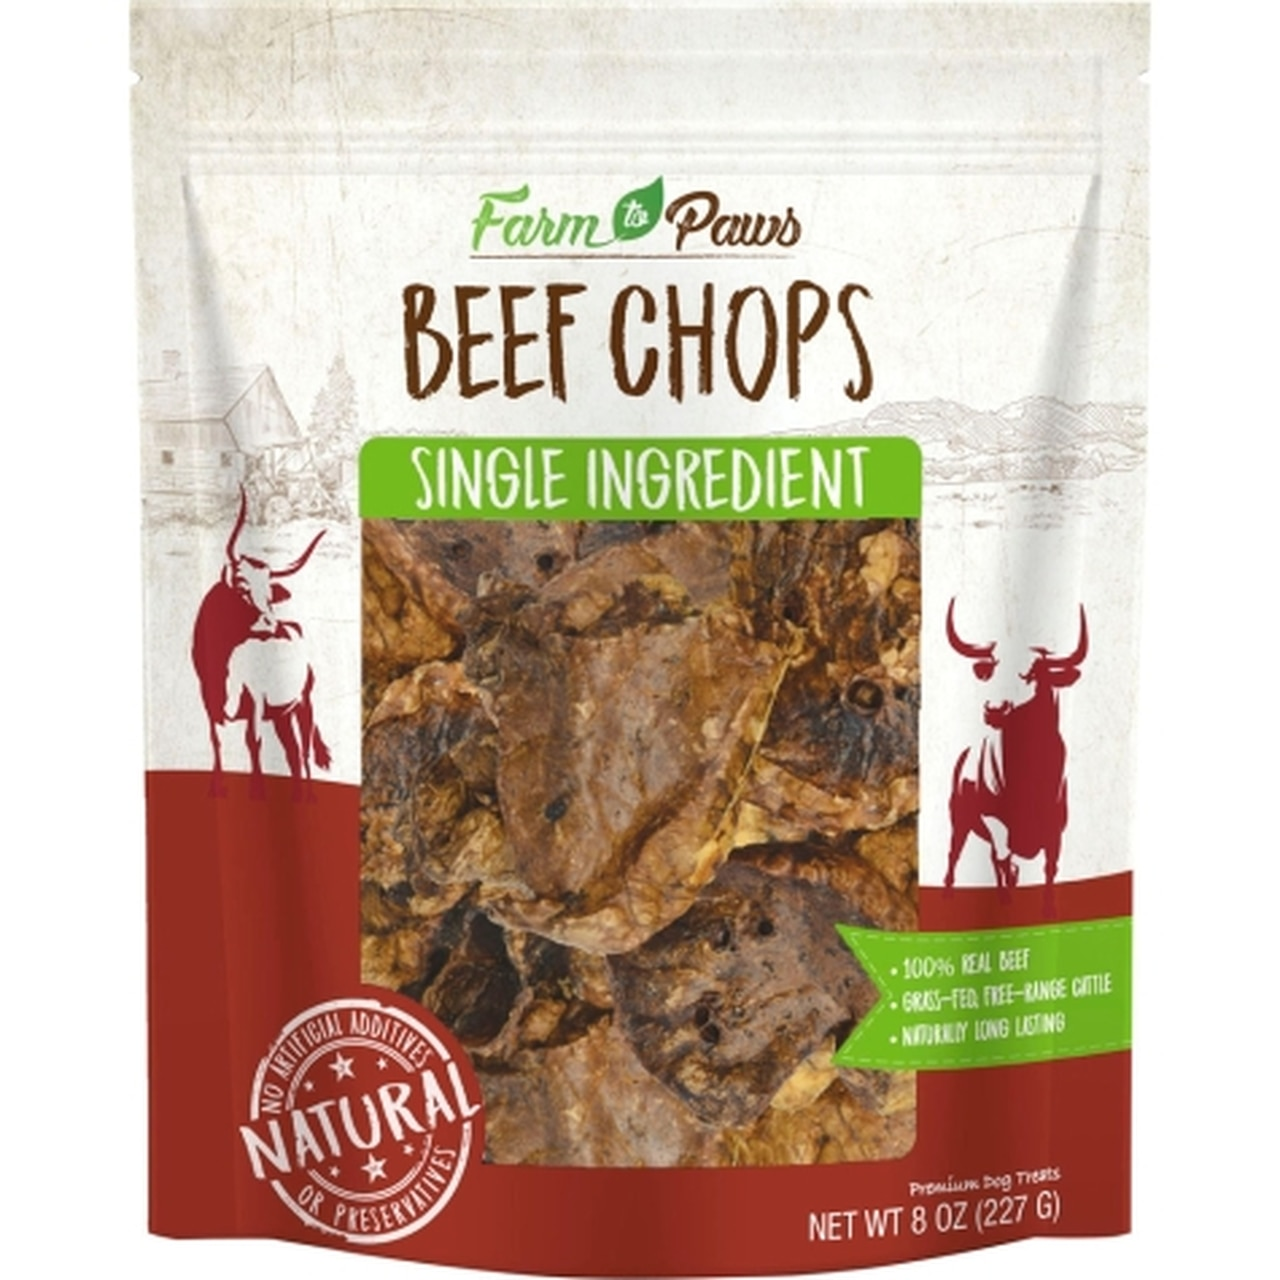 Farm to Paws Beef Chops Dog Treats, 8-oz